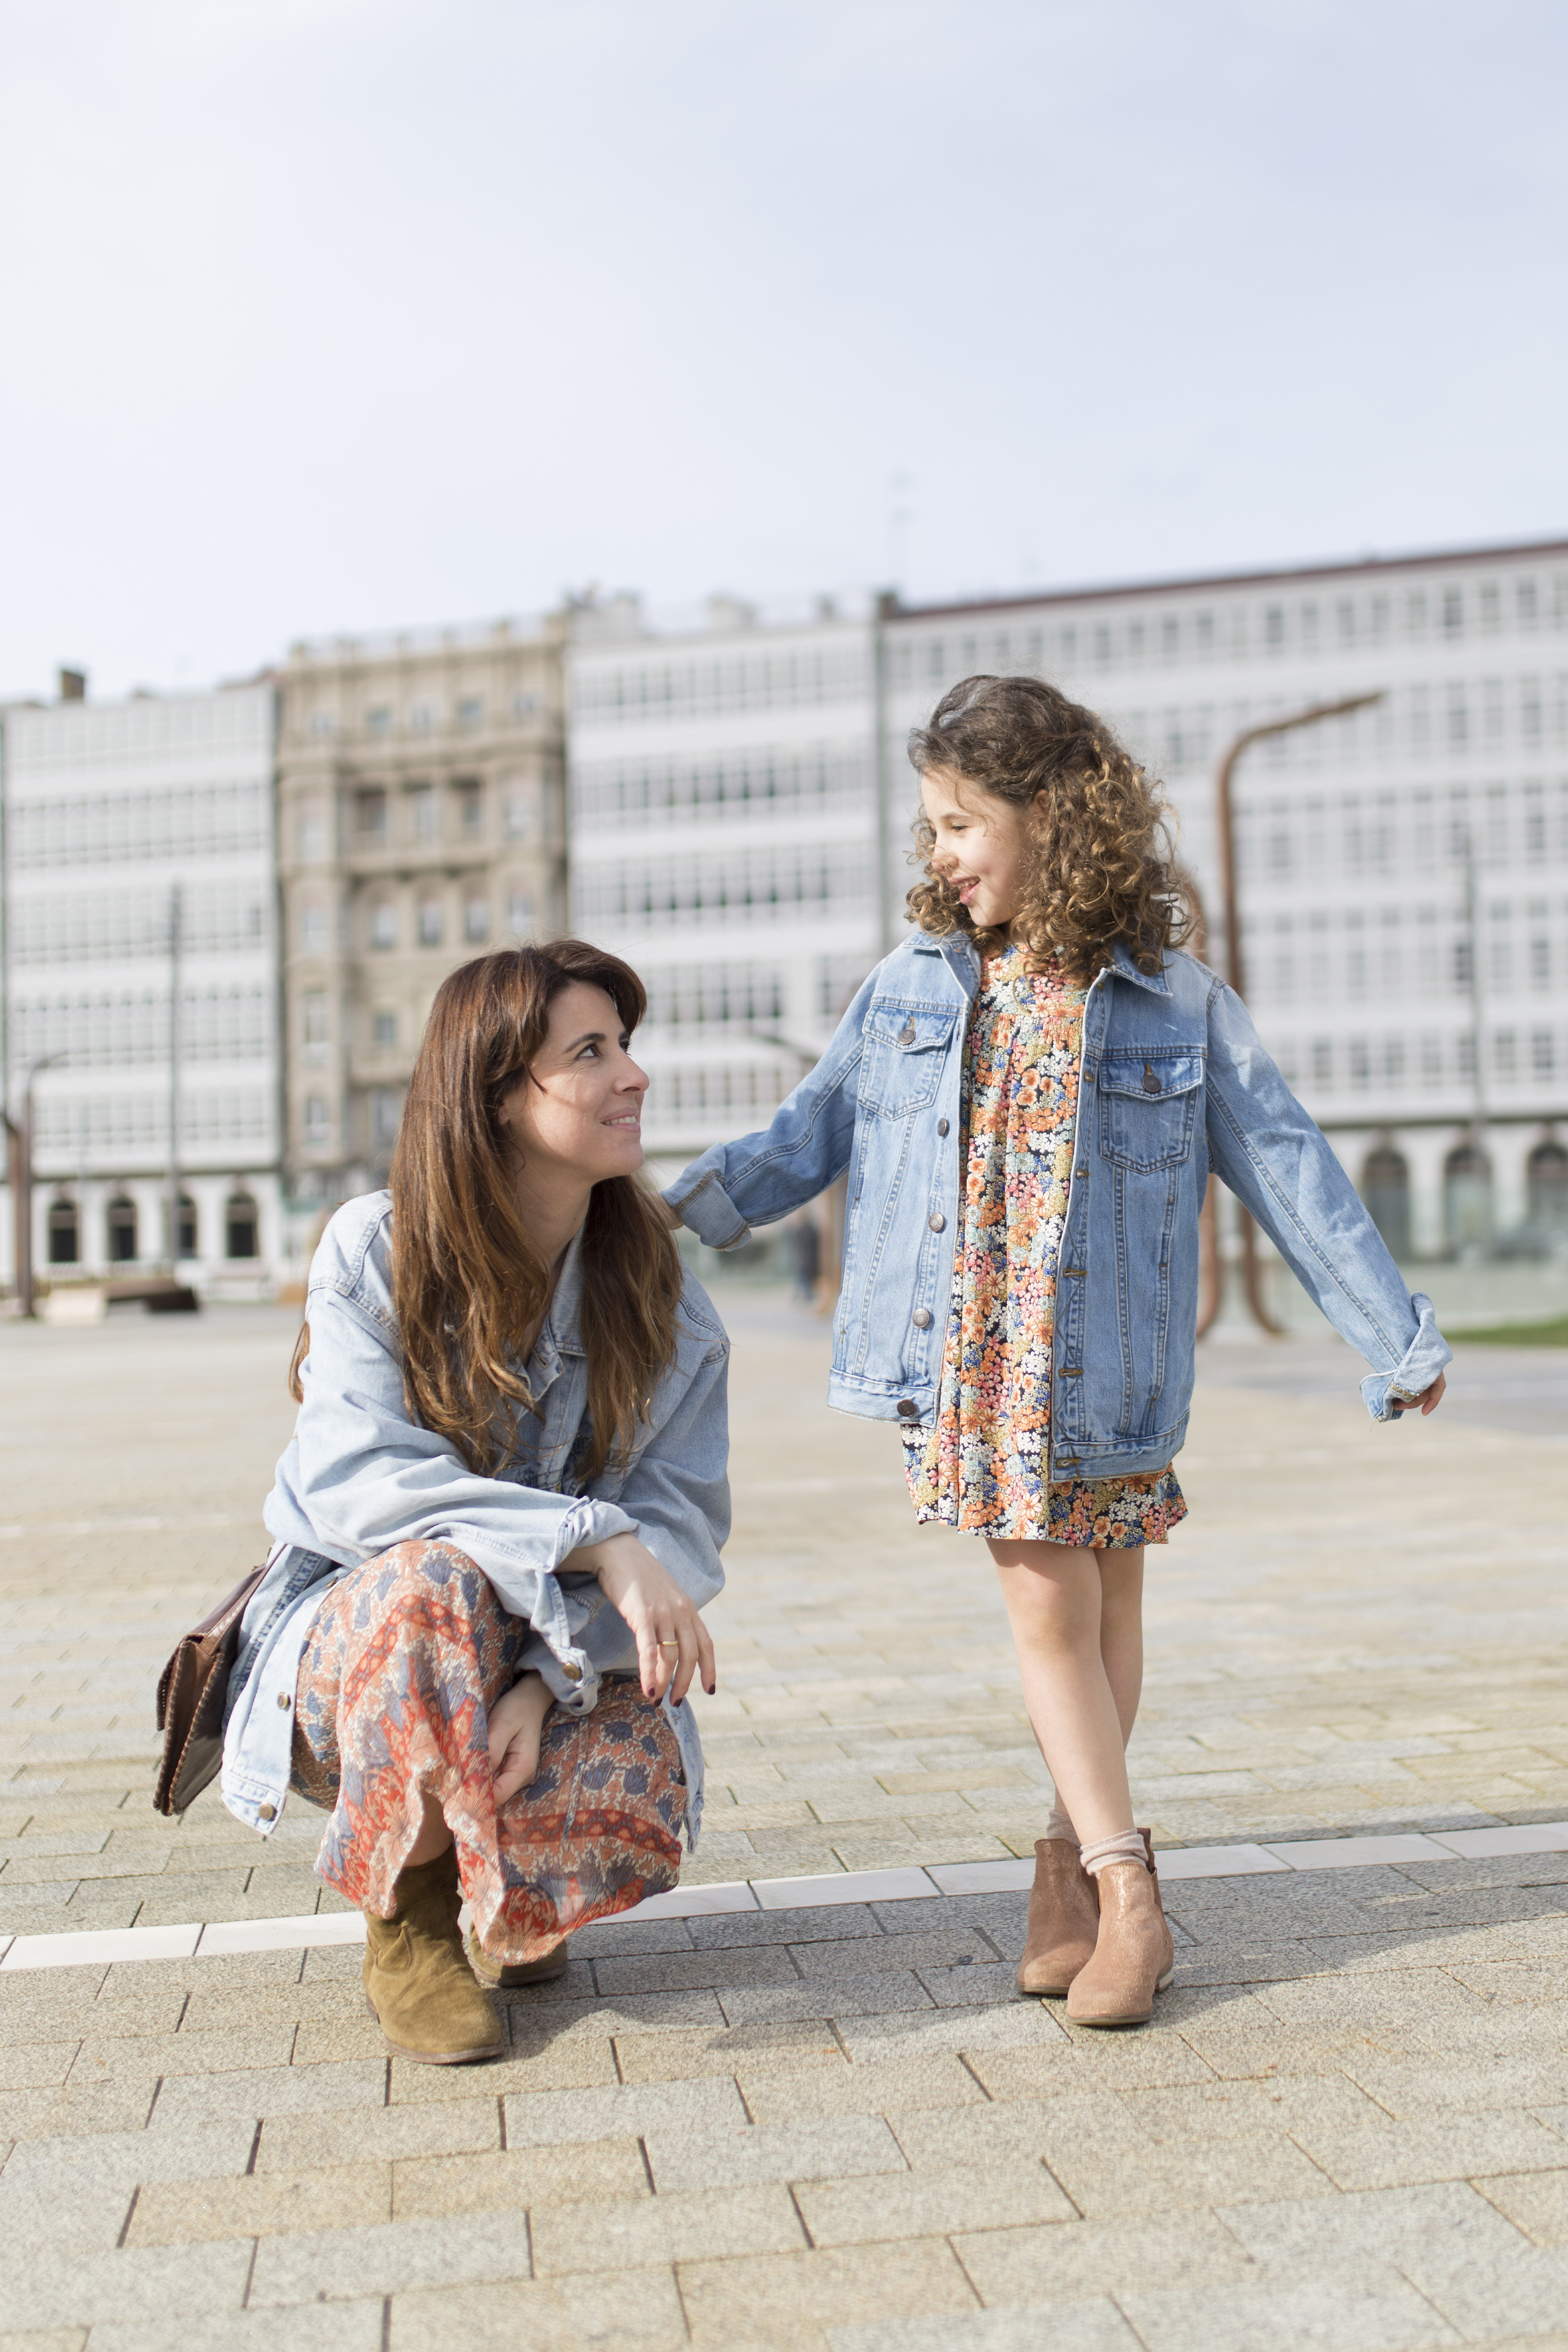 promod-zara kids-denim jacket-My partner-mi hija-Urban Outfitters- madre e hija- fashion-moda-street style-jimena&me-mother daughter